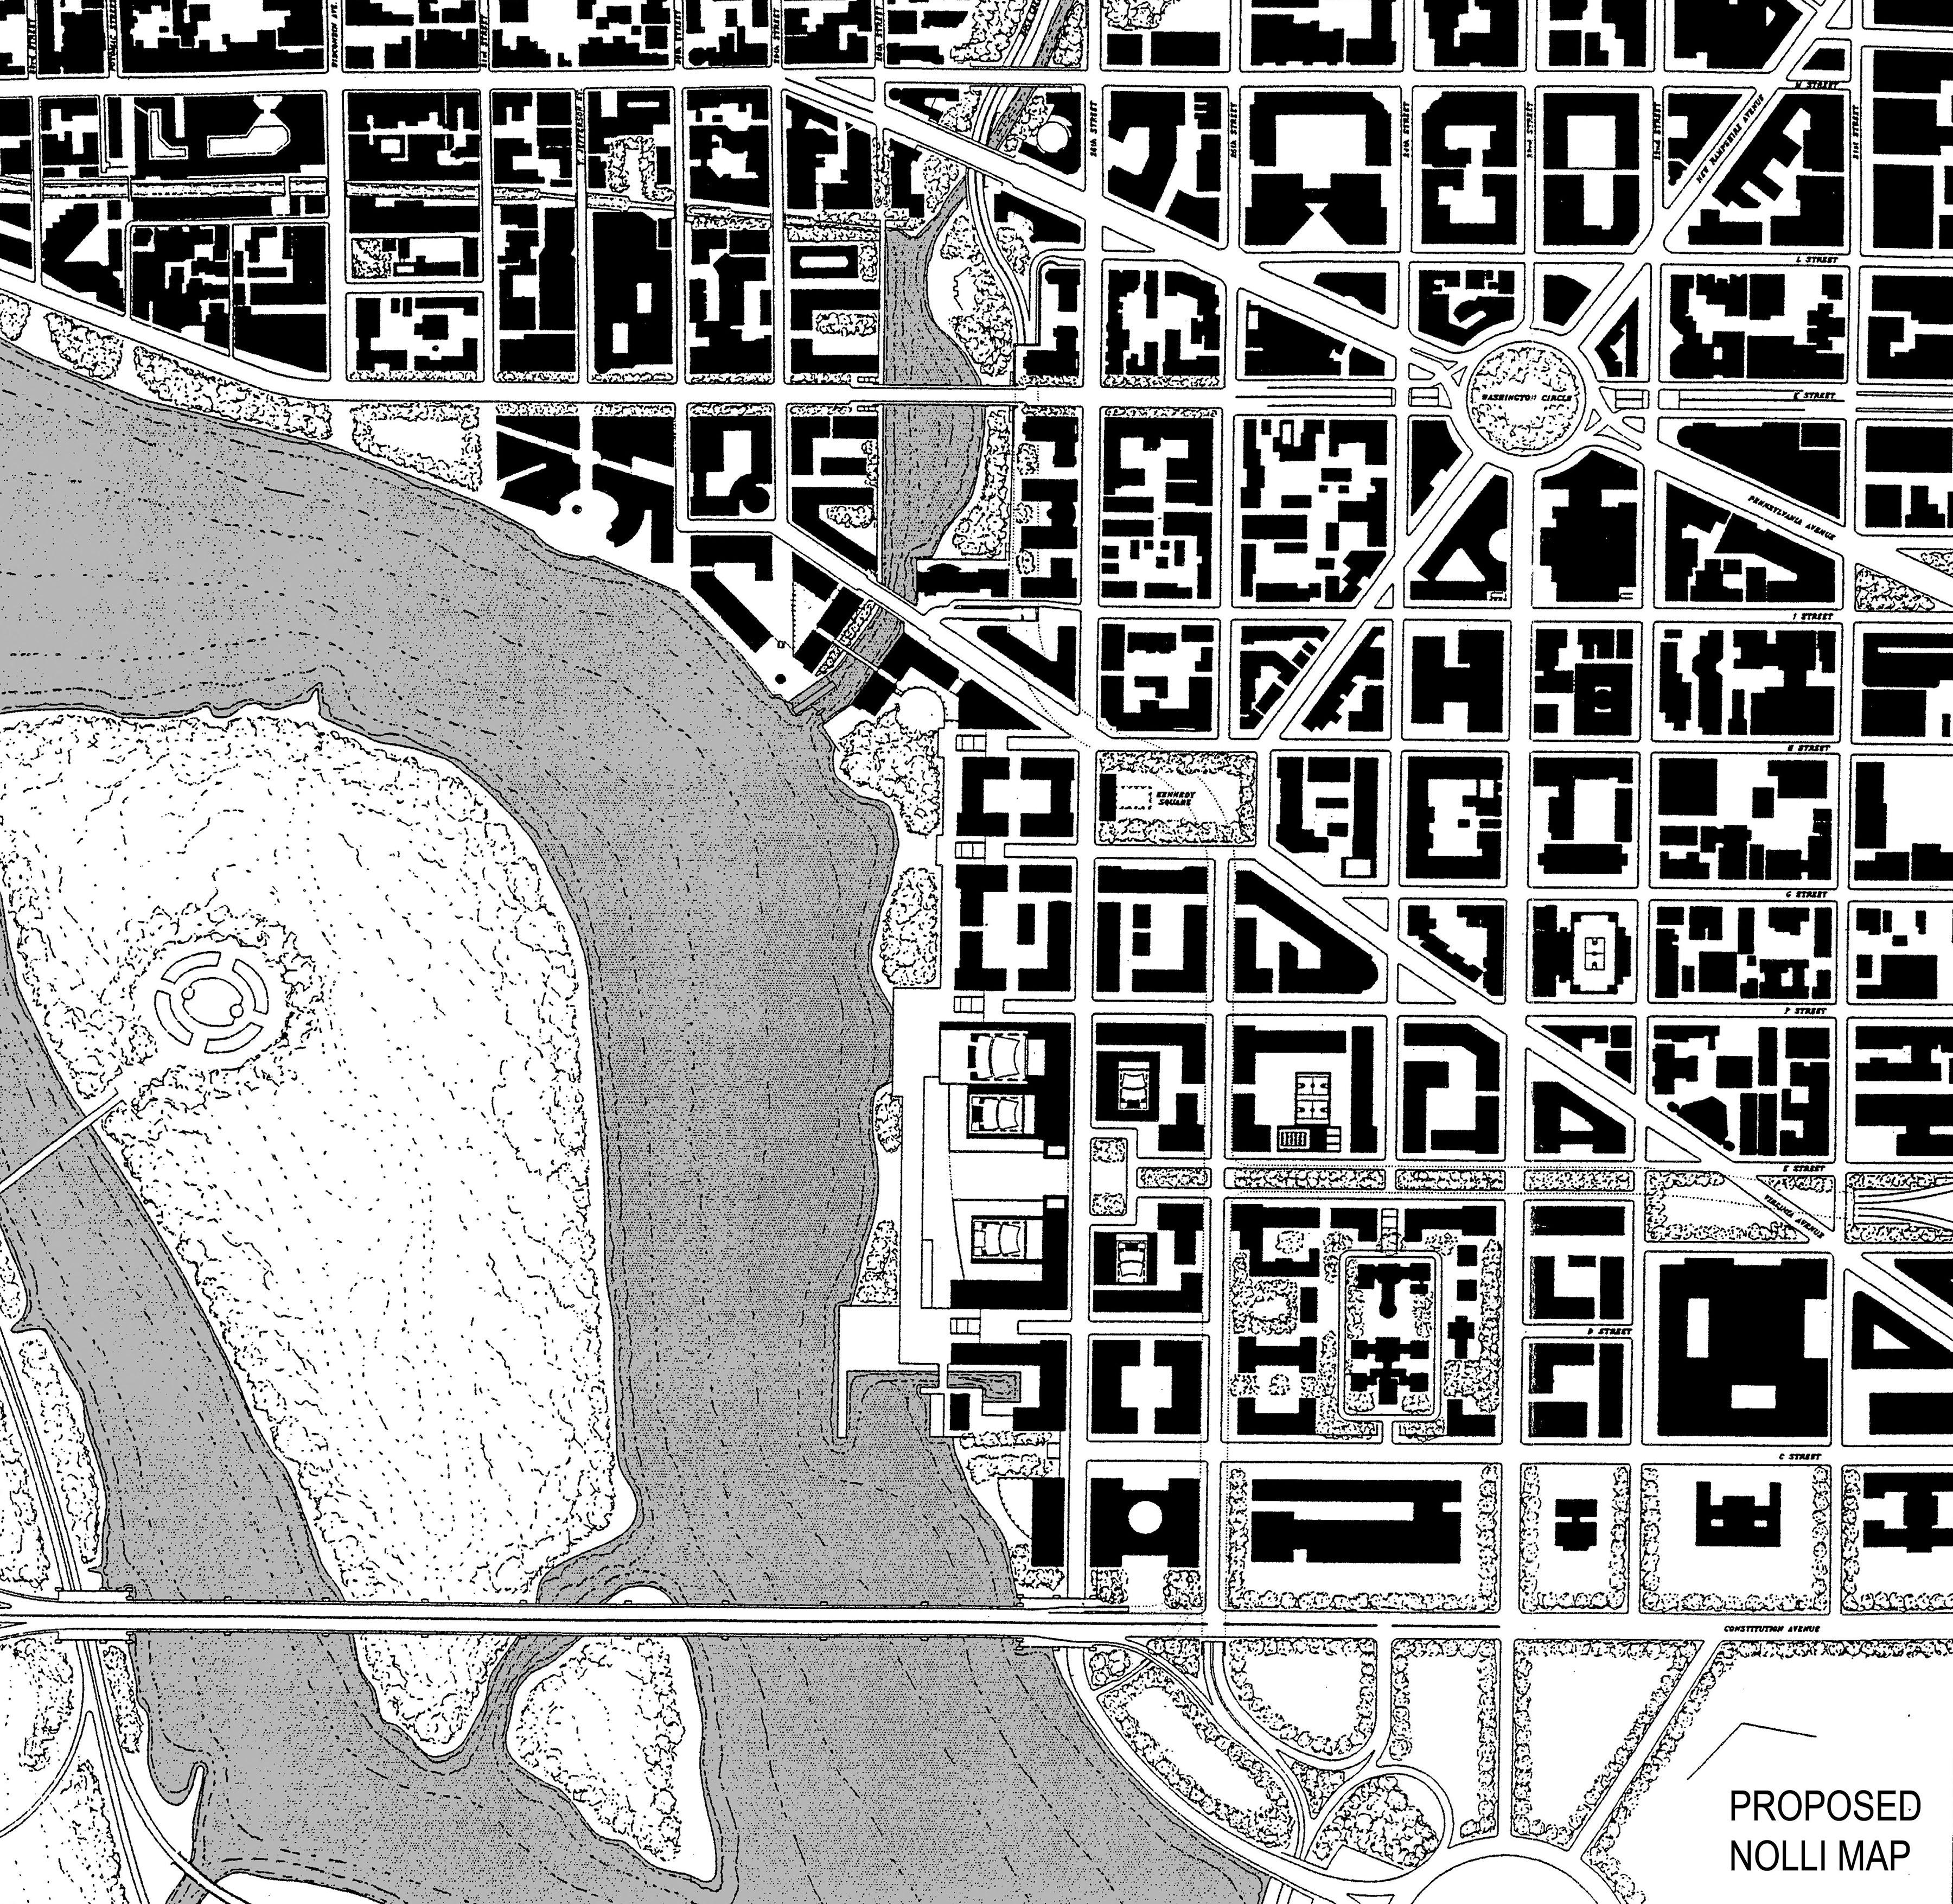 201502-271954 Nolli Map Of Dc on civil war map washington dc, star map washington dc, neighborhood and ward map dc, county map washington dc, usa map washington dc, map showing washington, printable map washington dc, subway map for washington dc, us map showing dc, map ofwashington dc, city map dc, print map washington dc, zip code map nw dc, united states map with dc, map with metro stops dc, simple map washington dc, street map with metro stations washington dc, interactive metro map washington dc, wmata map washington dc, google maps dc,